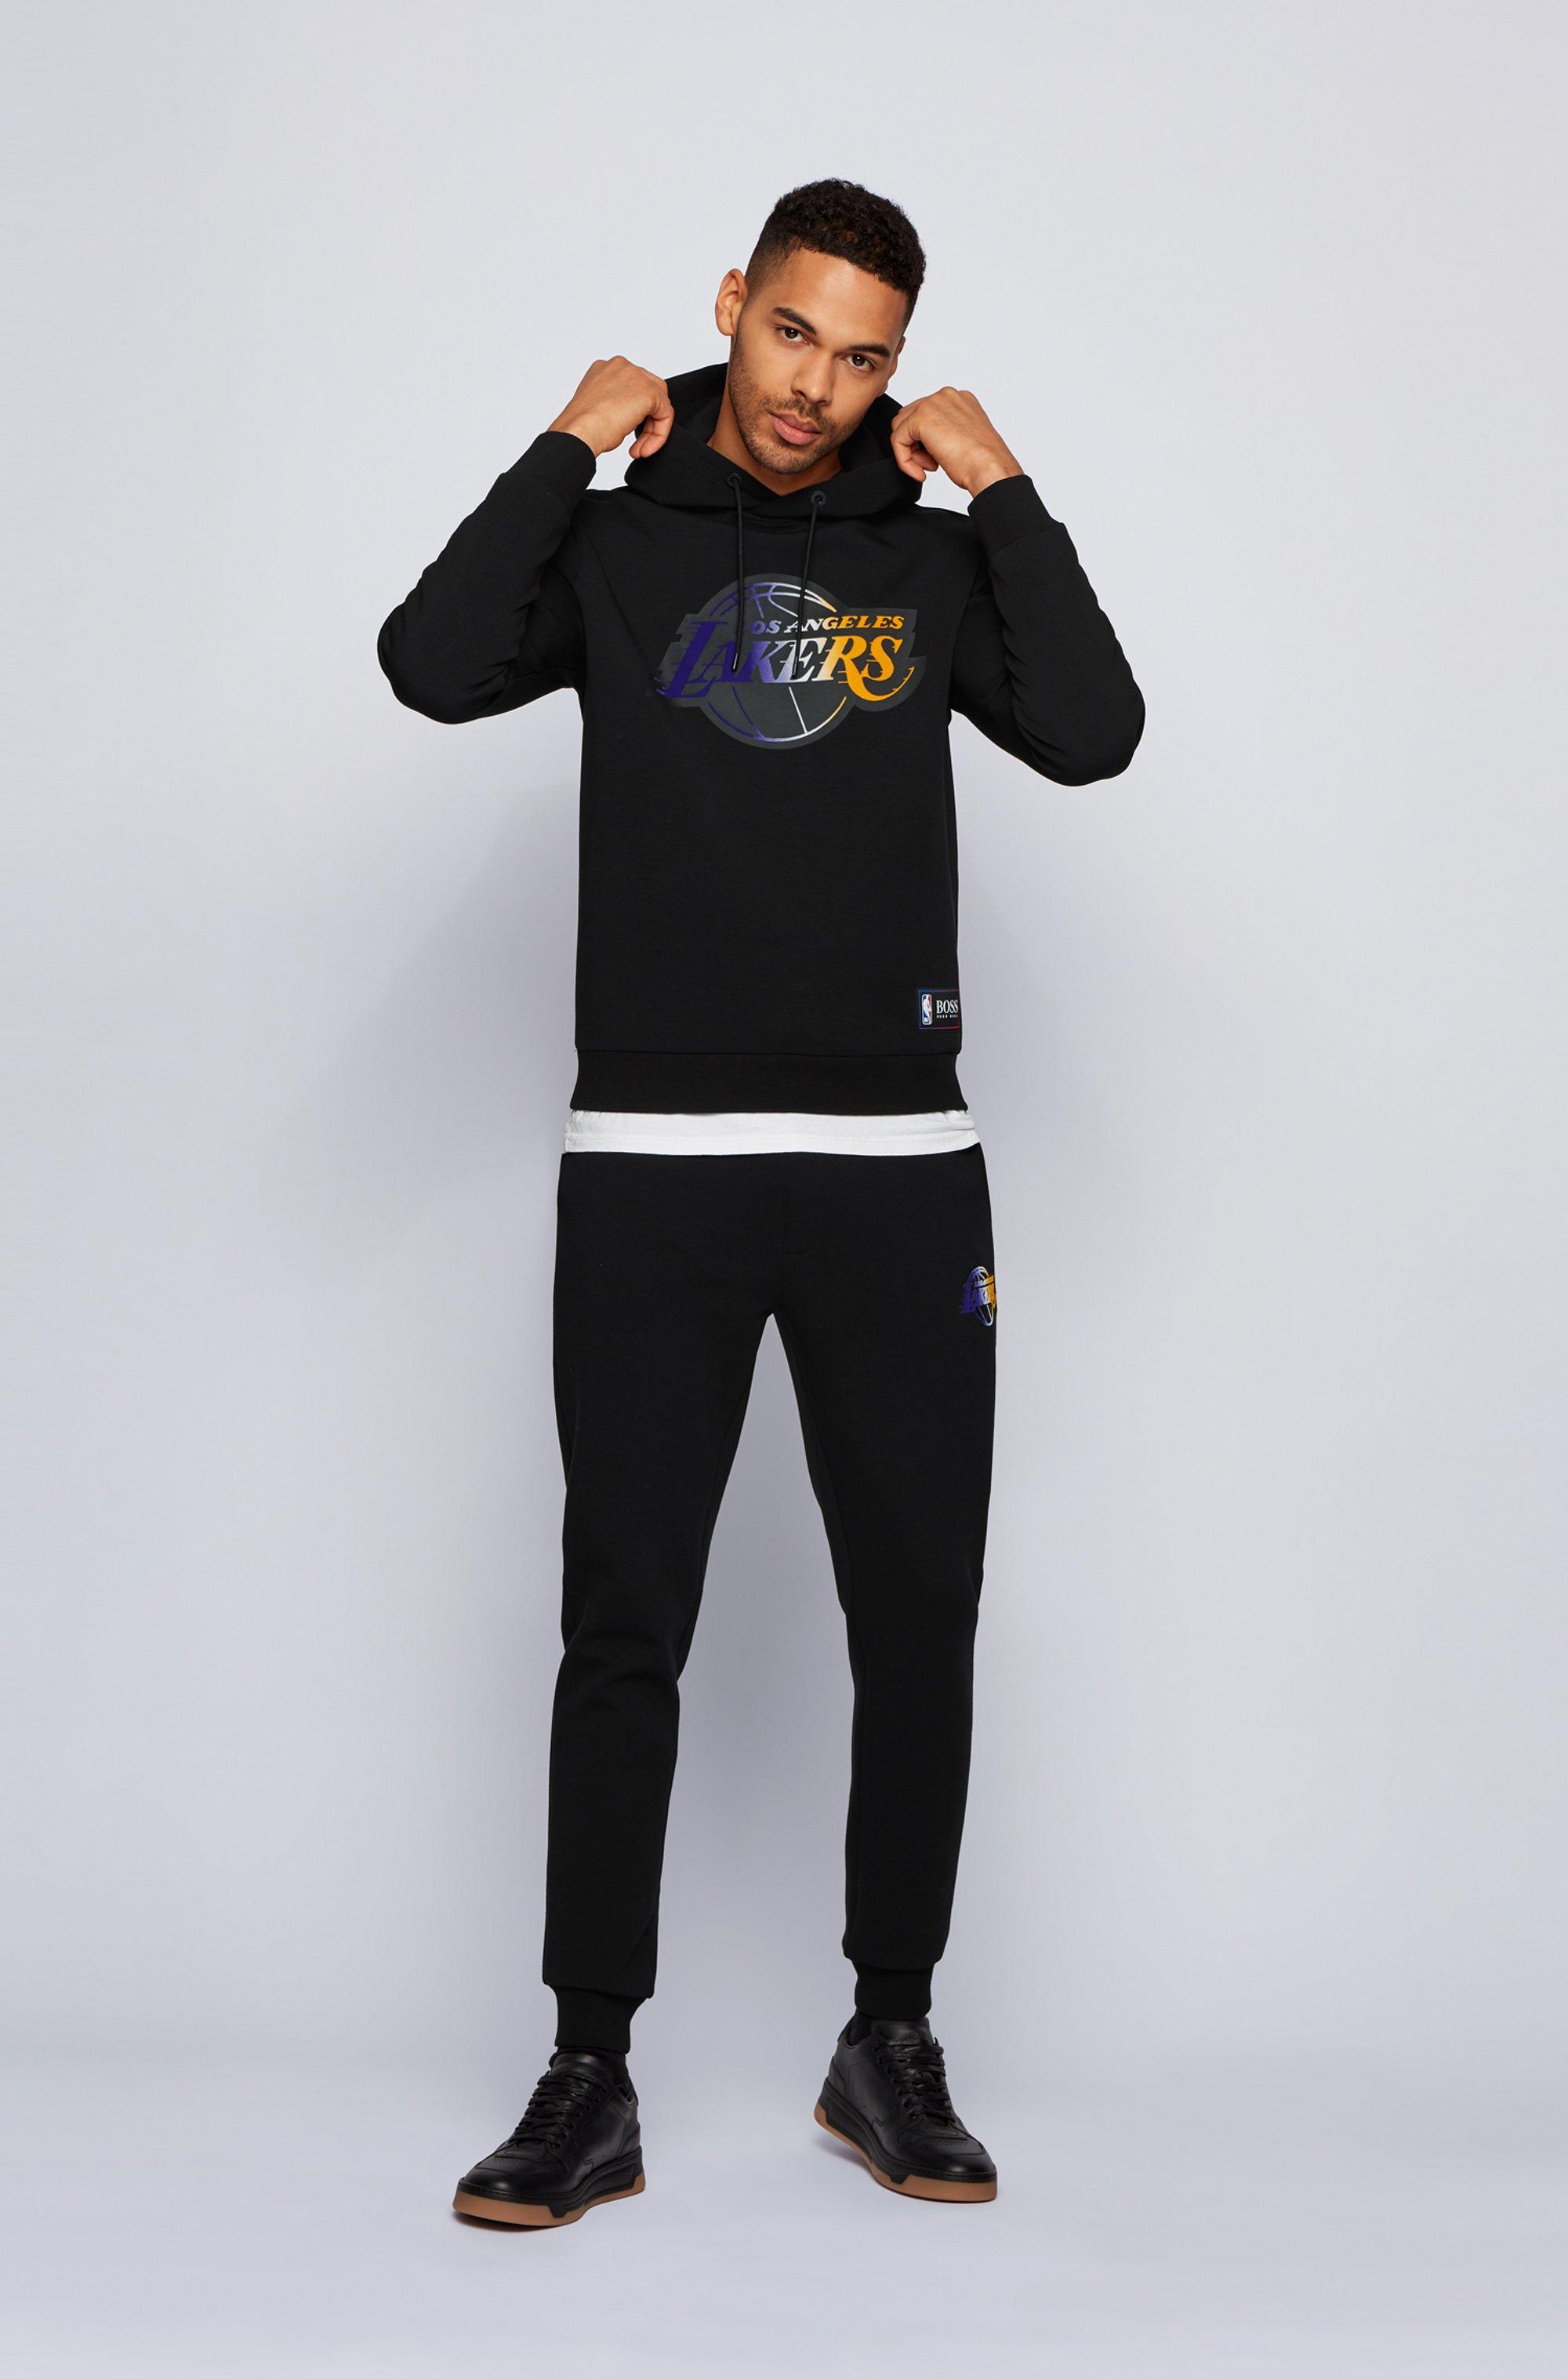 BOSS x NBA hooded sweatshirt with team logo